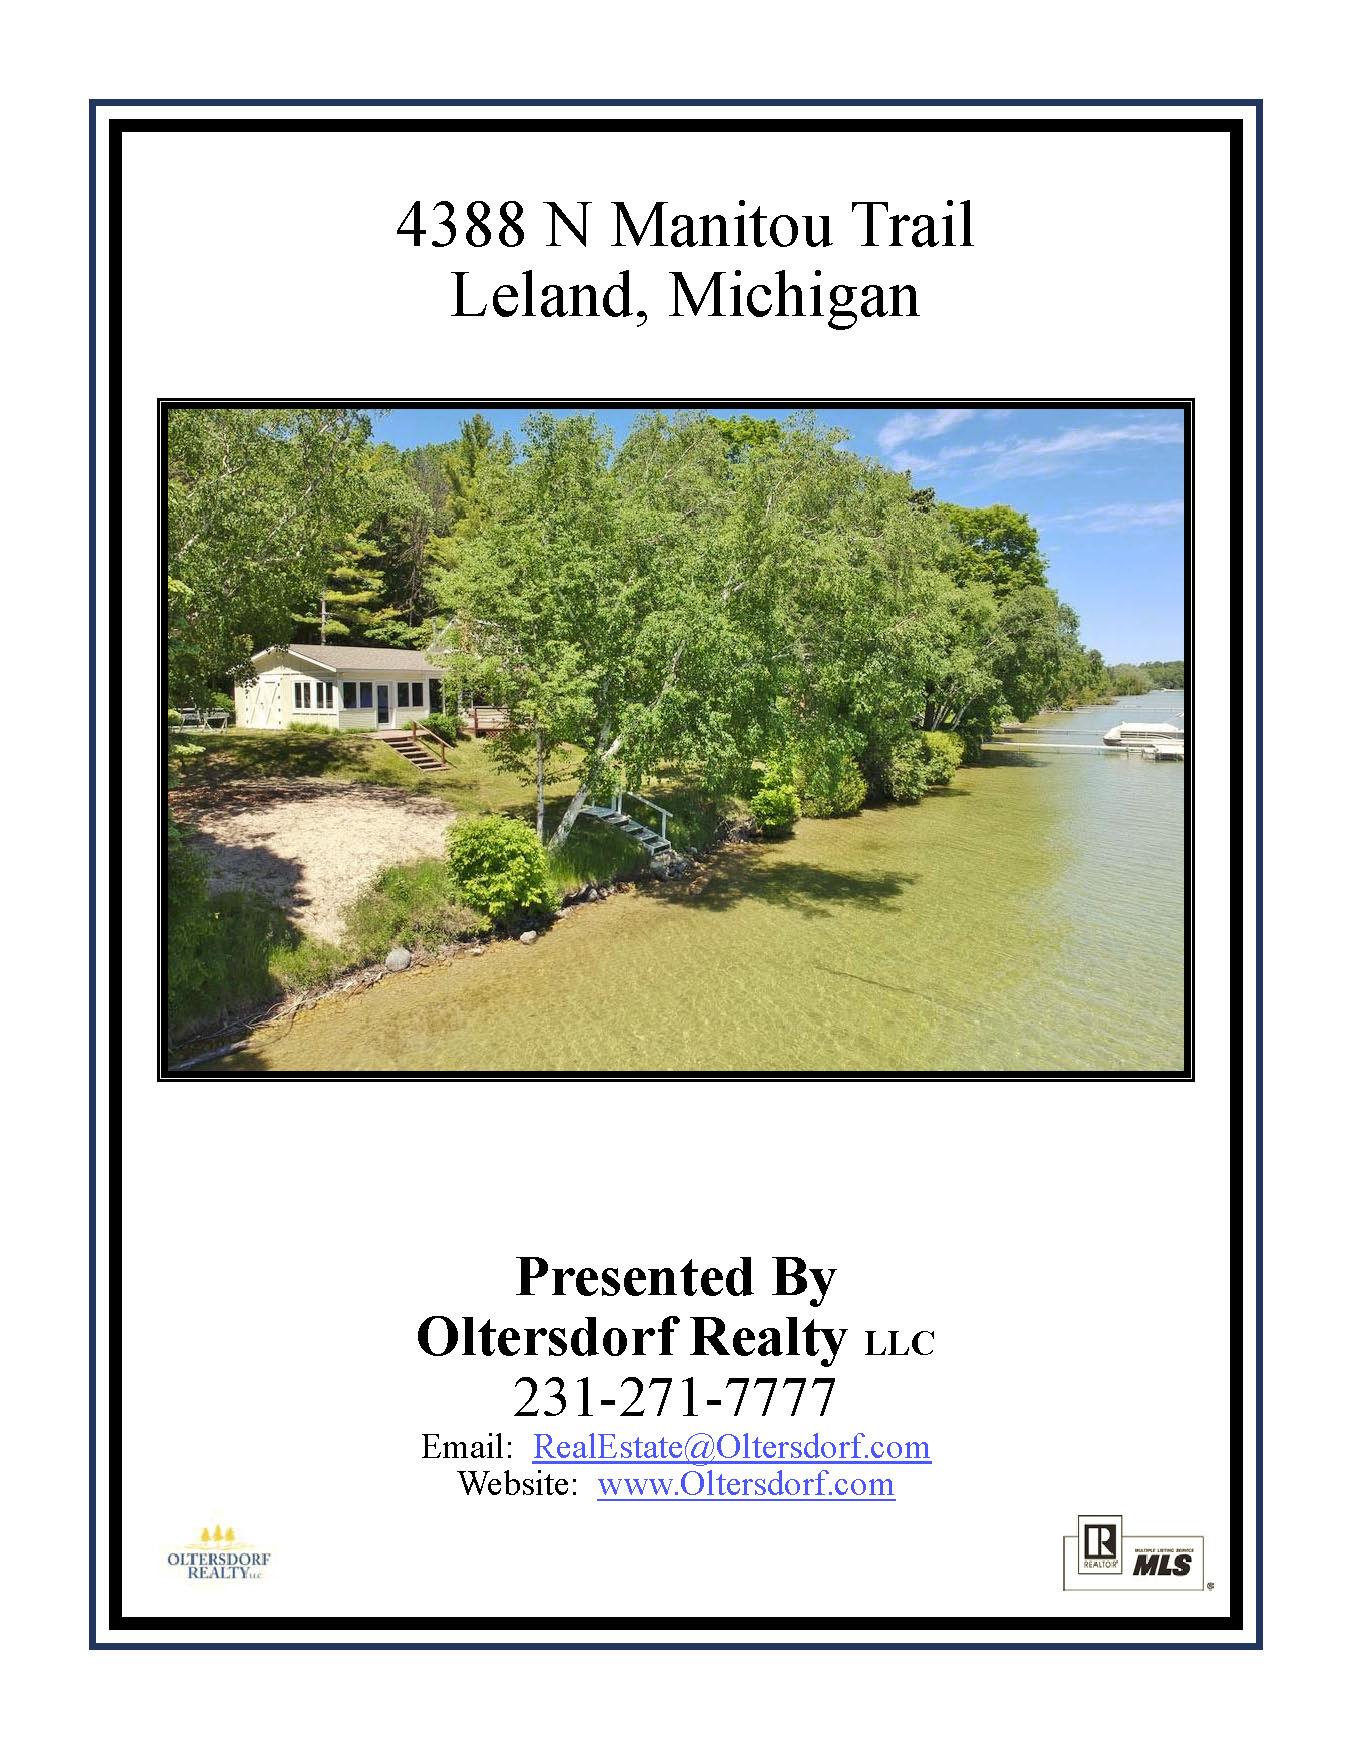 4388 N Manitou Trail, Leland - Marketing packet by Oltersdorf Realty LLC (1).jpg